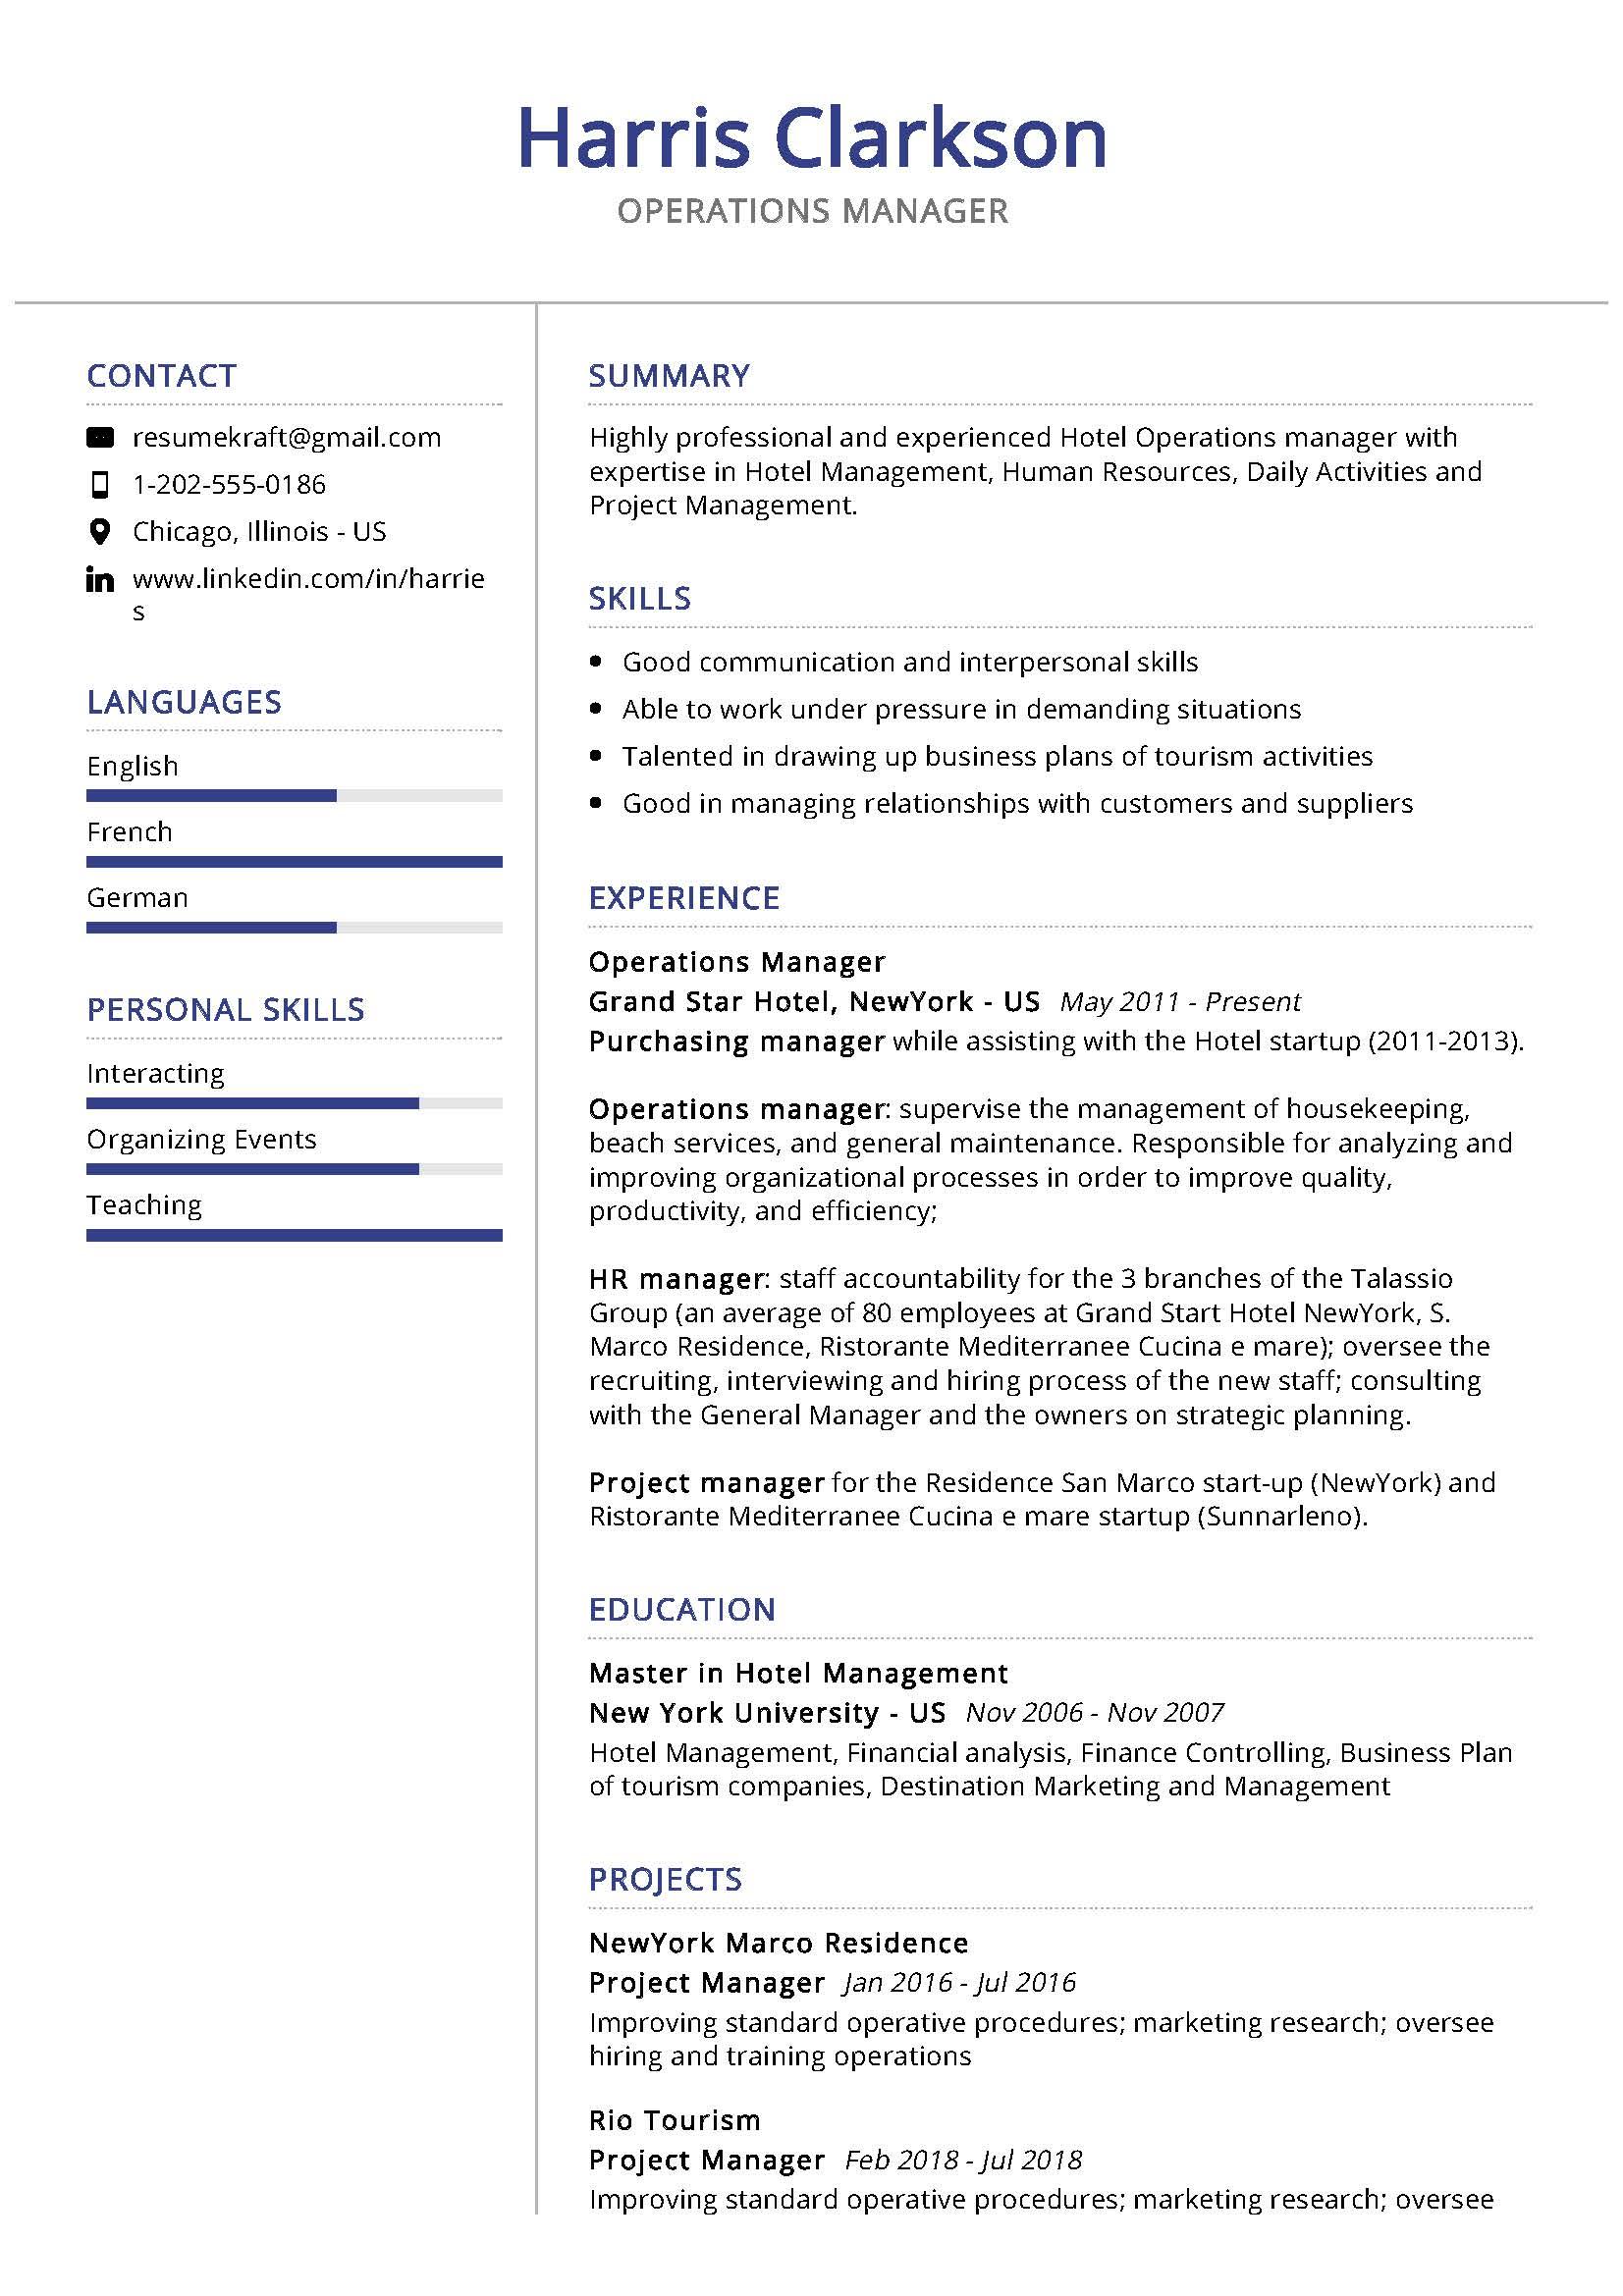 Operations Manager Resume Sample Writing Tips 2020 Resumekraft